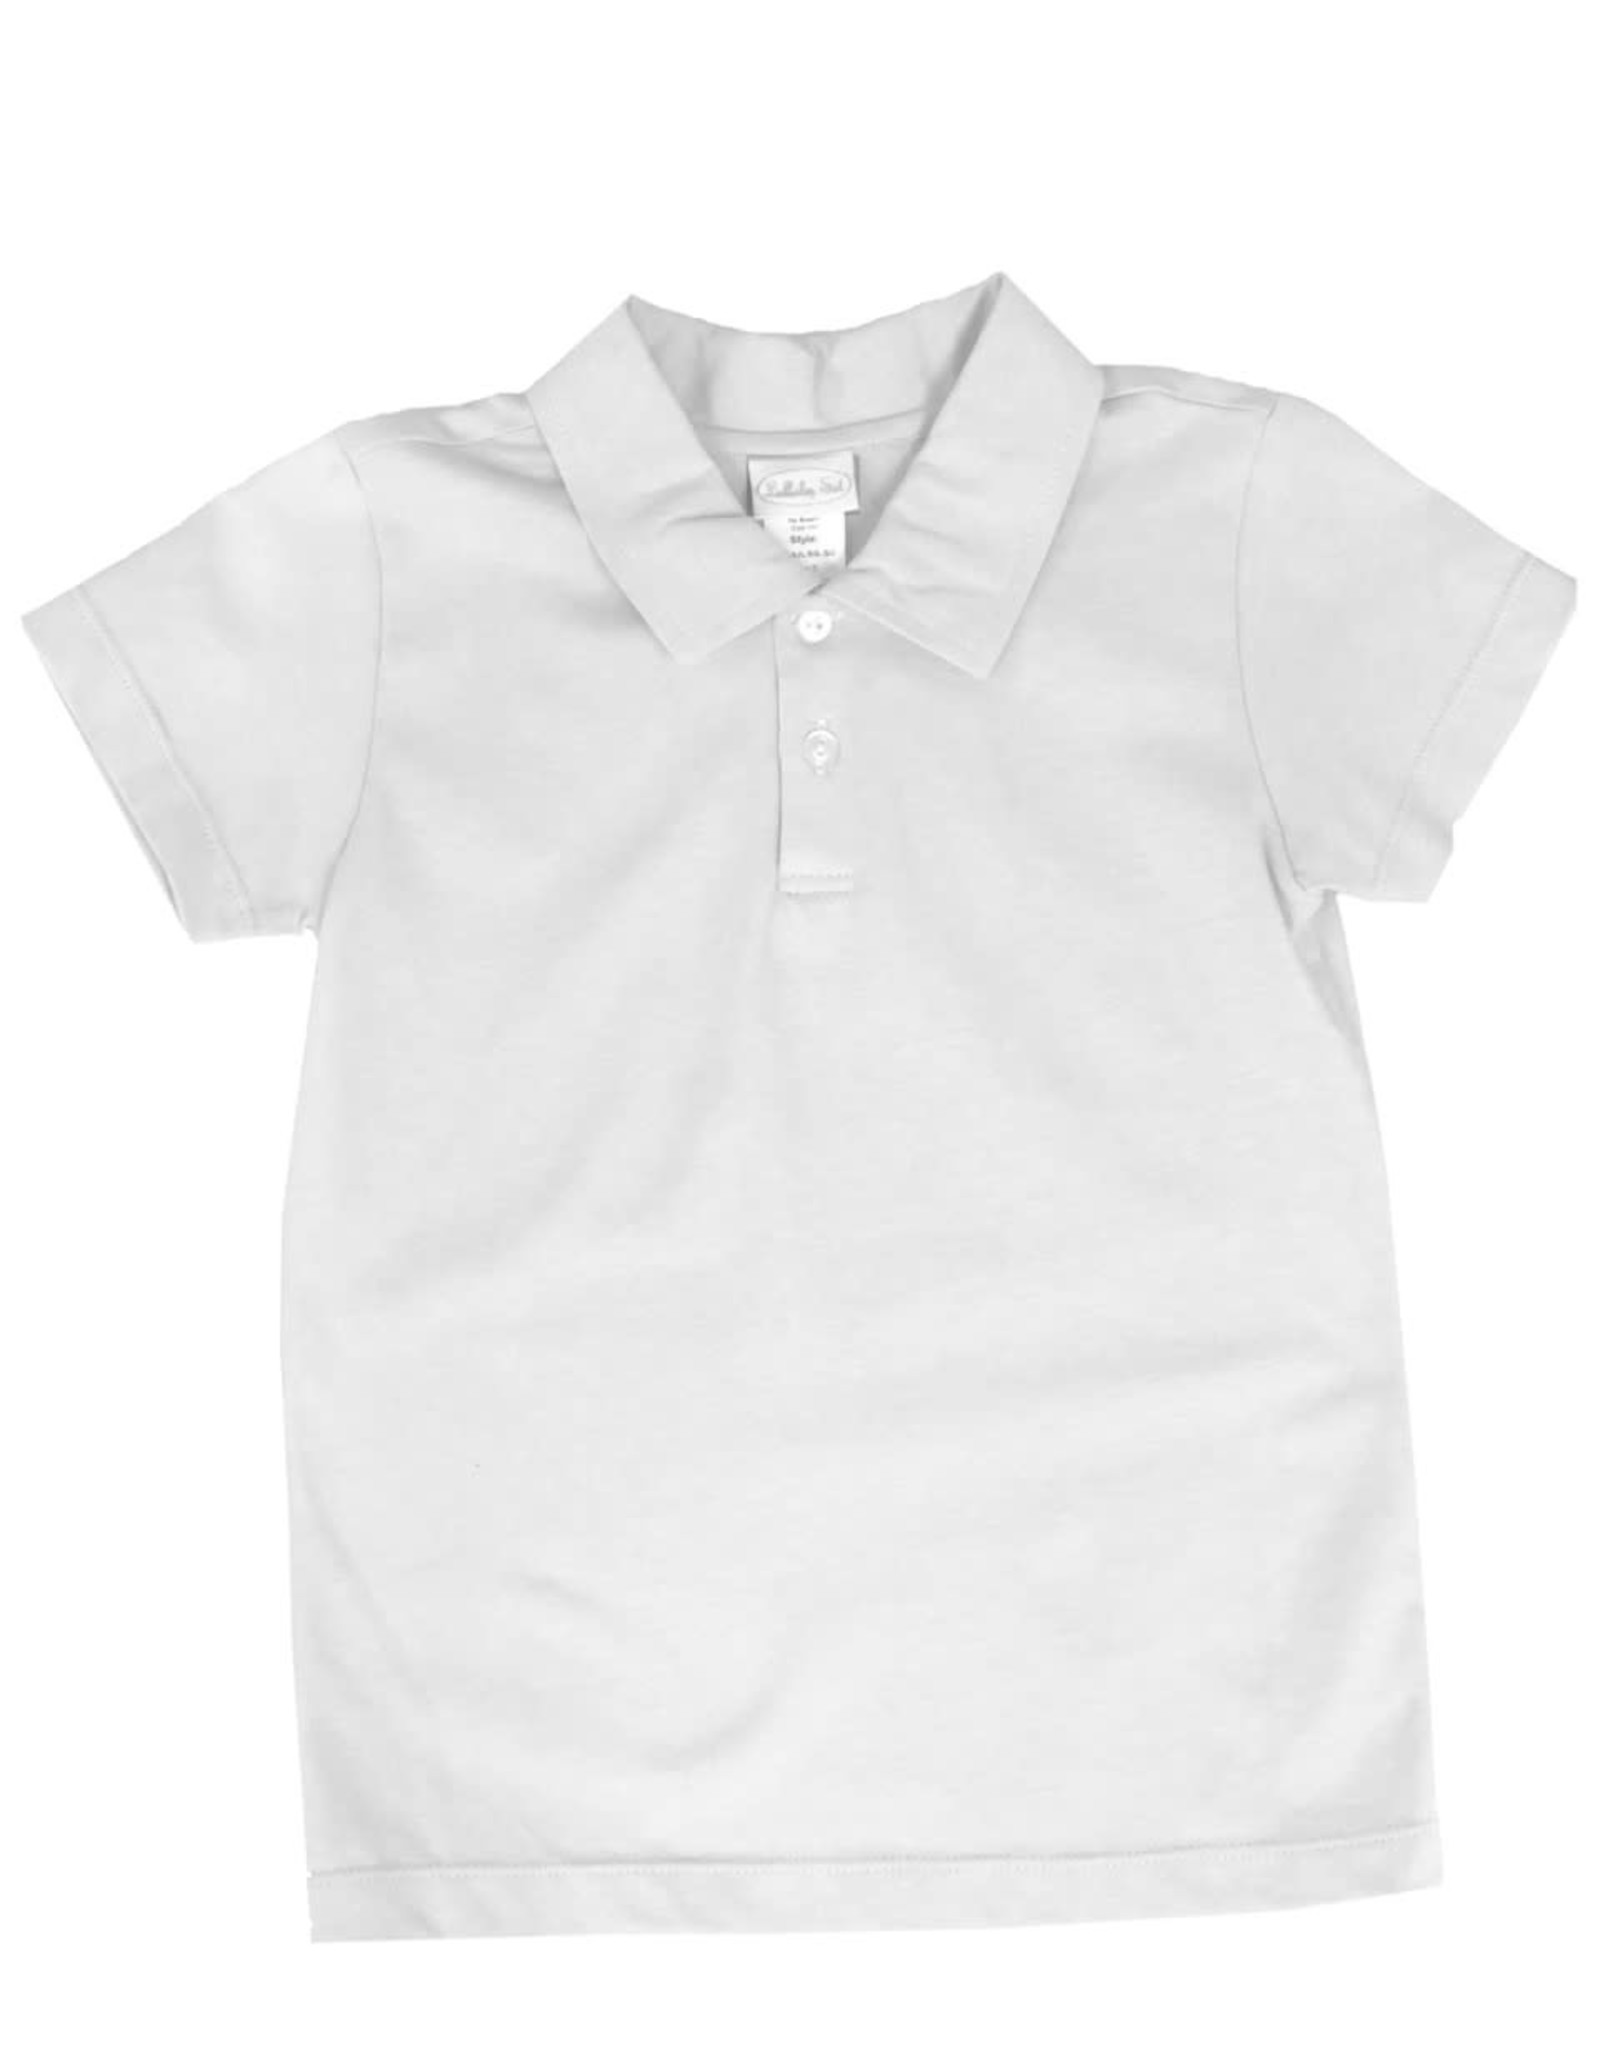 LullabySet Parker Polo White